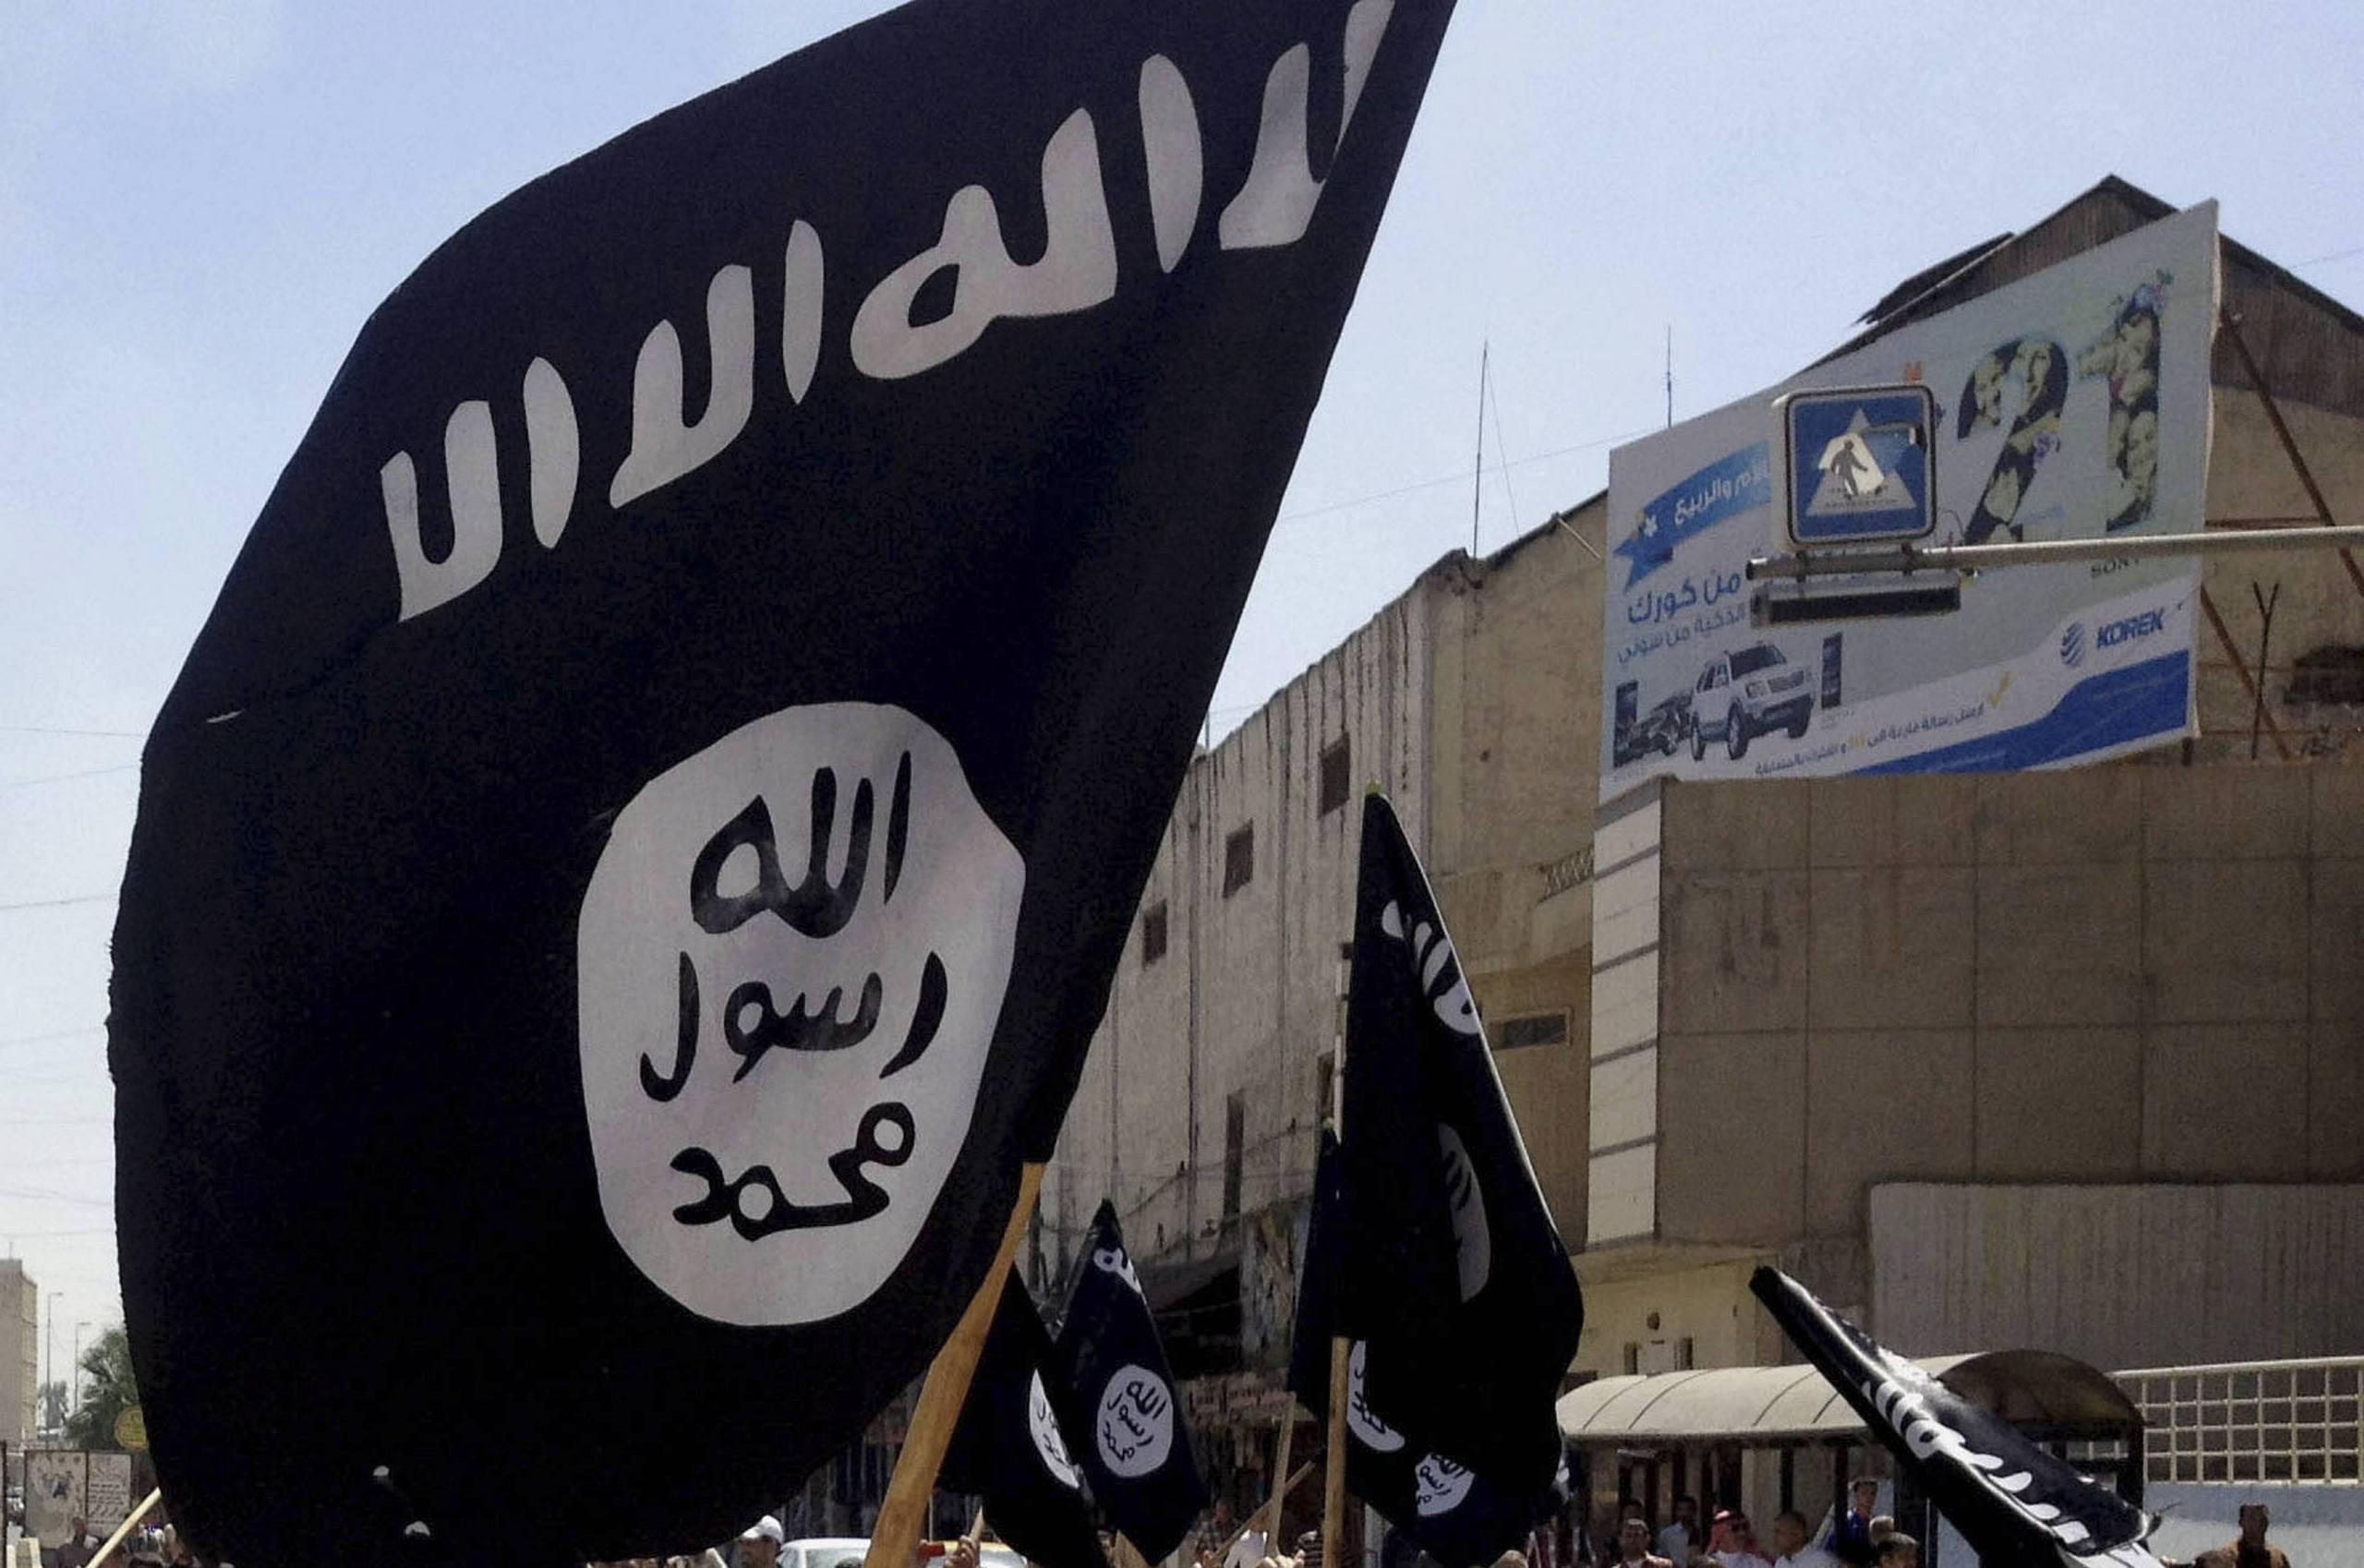 Handlingsplan mot extremism